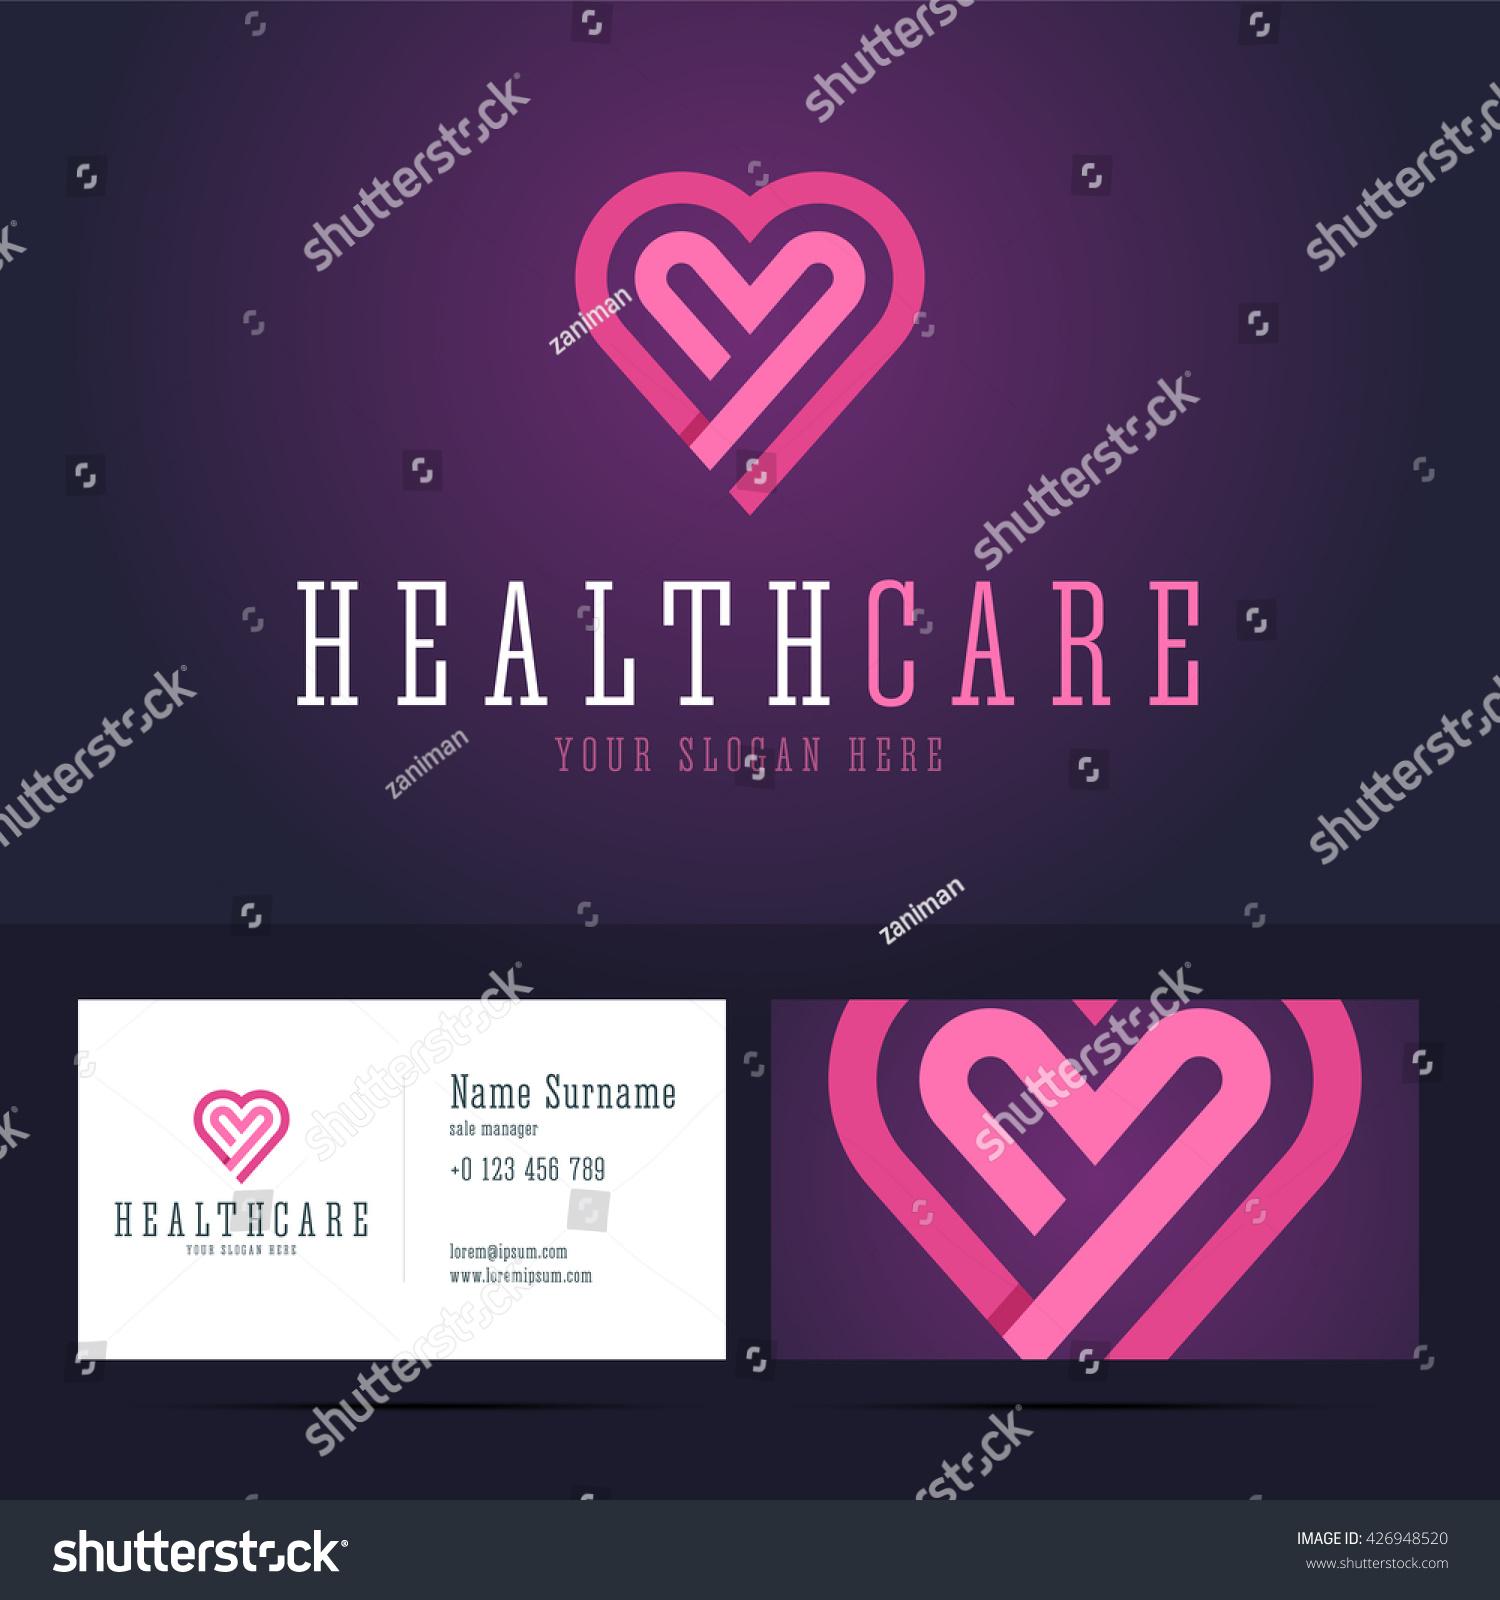 health care logo business card template stock vector